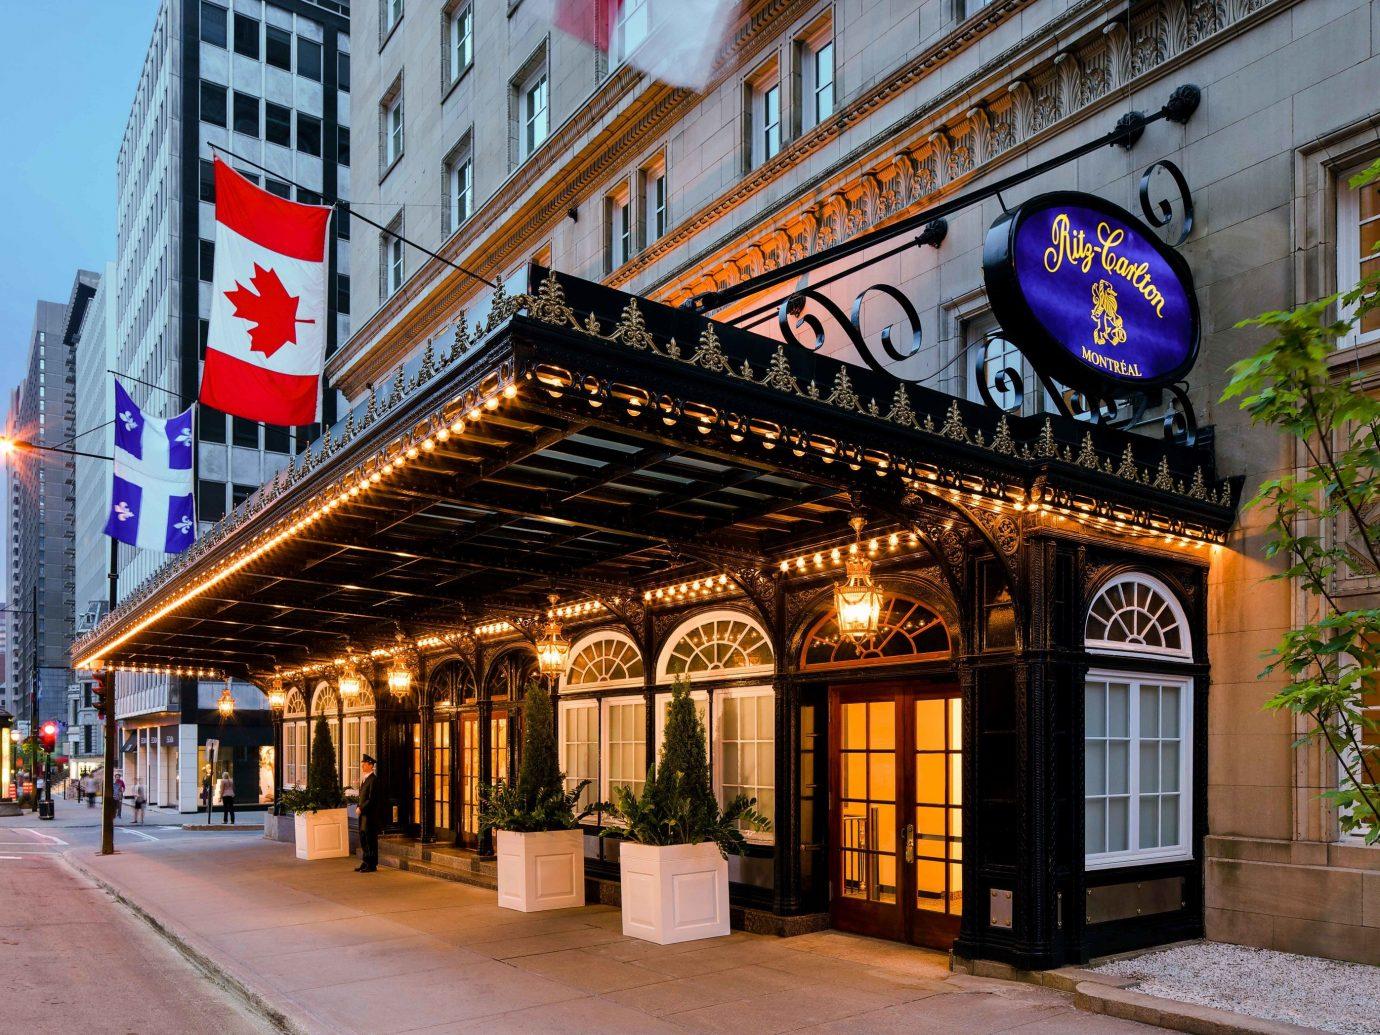 Canada Hotels Montreal Trip Ideas landmark Town City neighbourhood Downtown building mixed use facade street